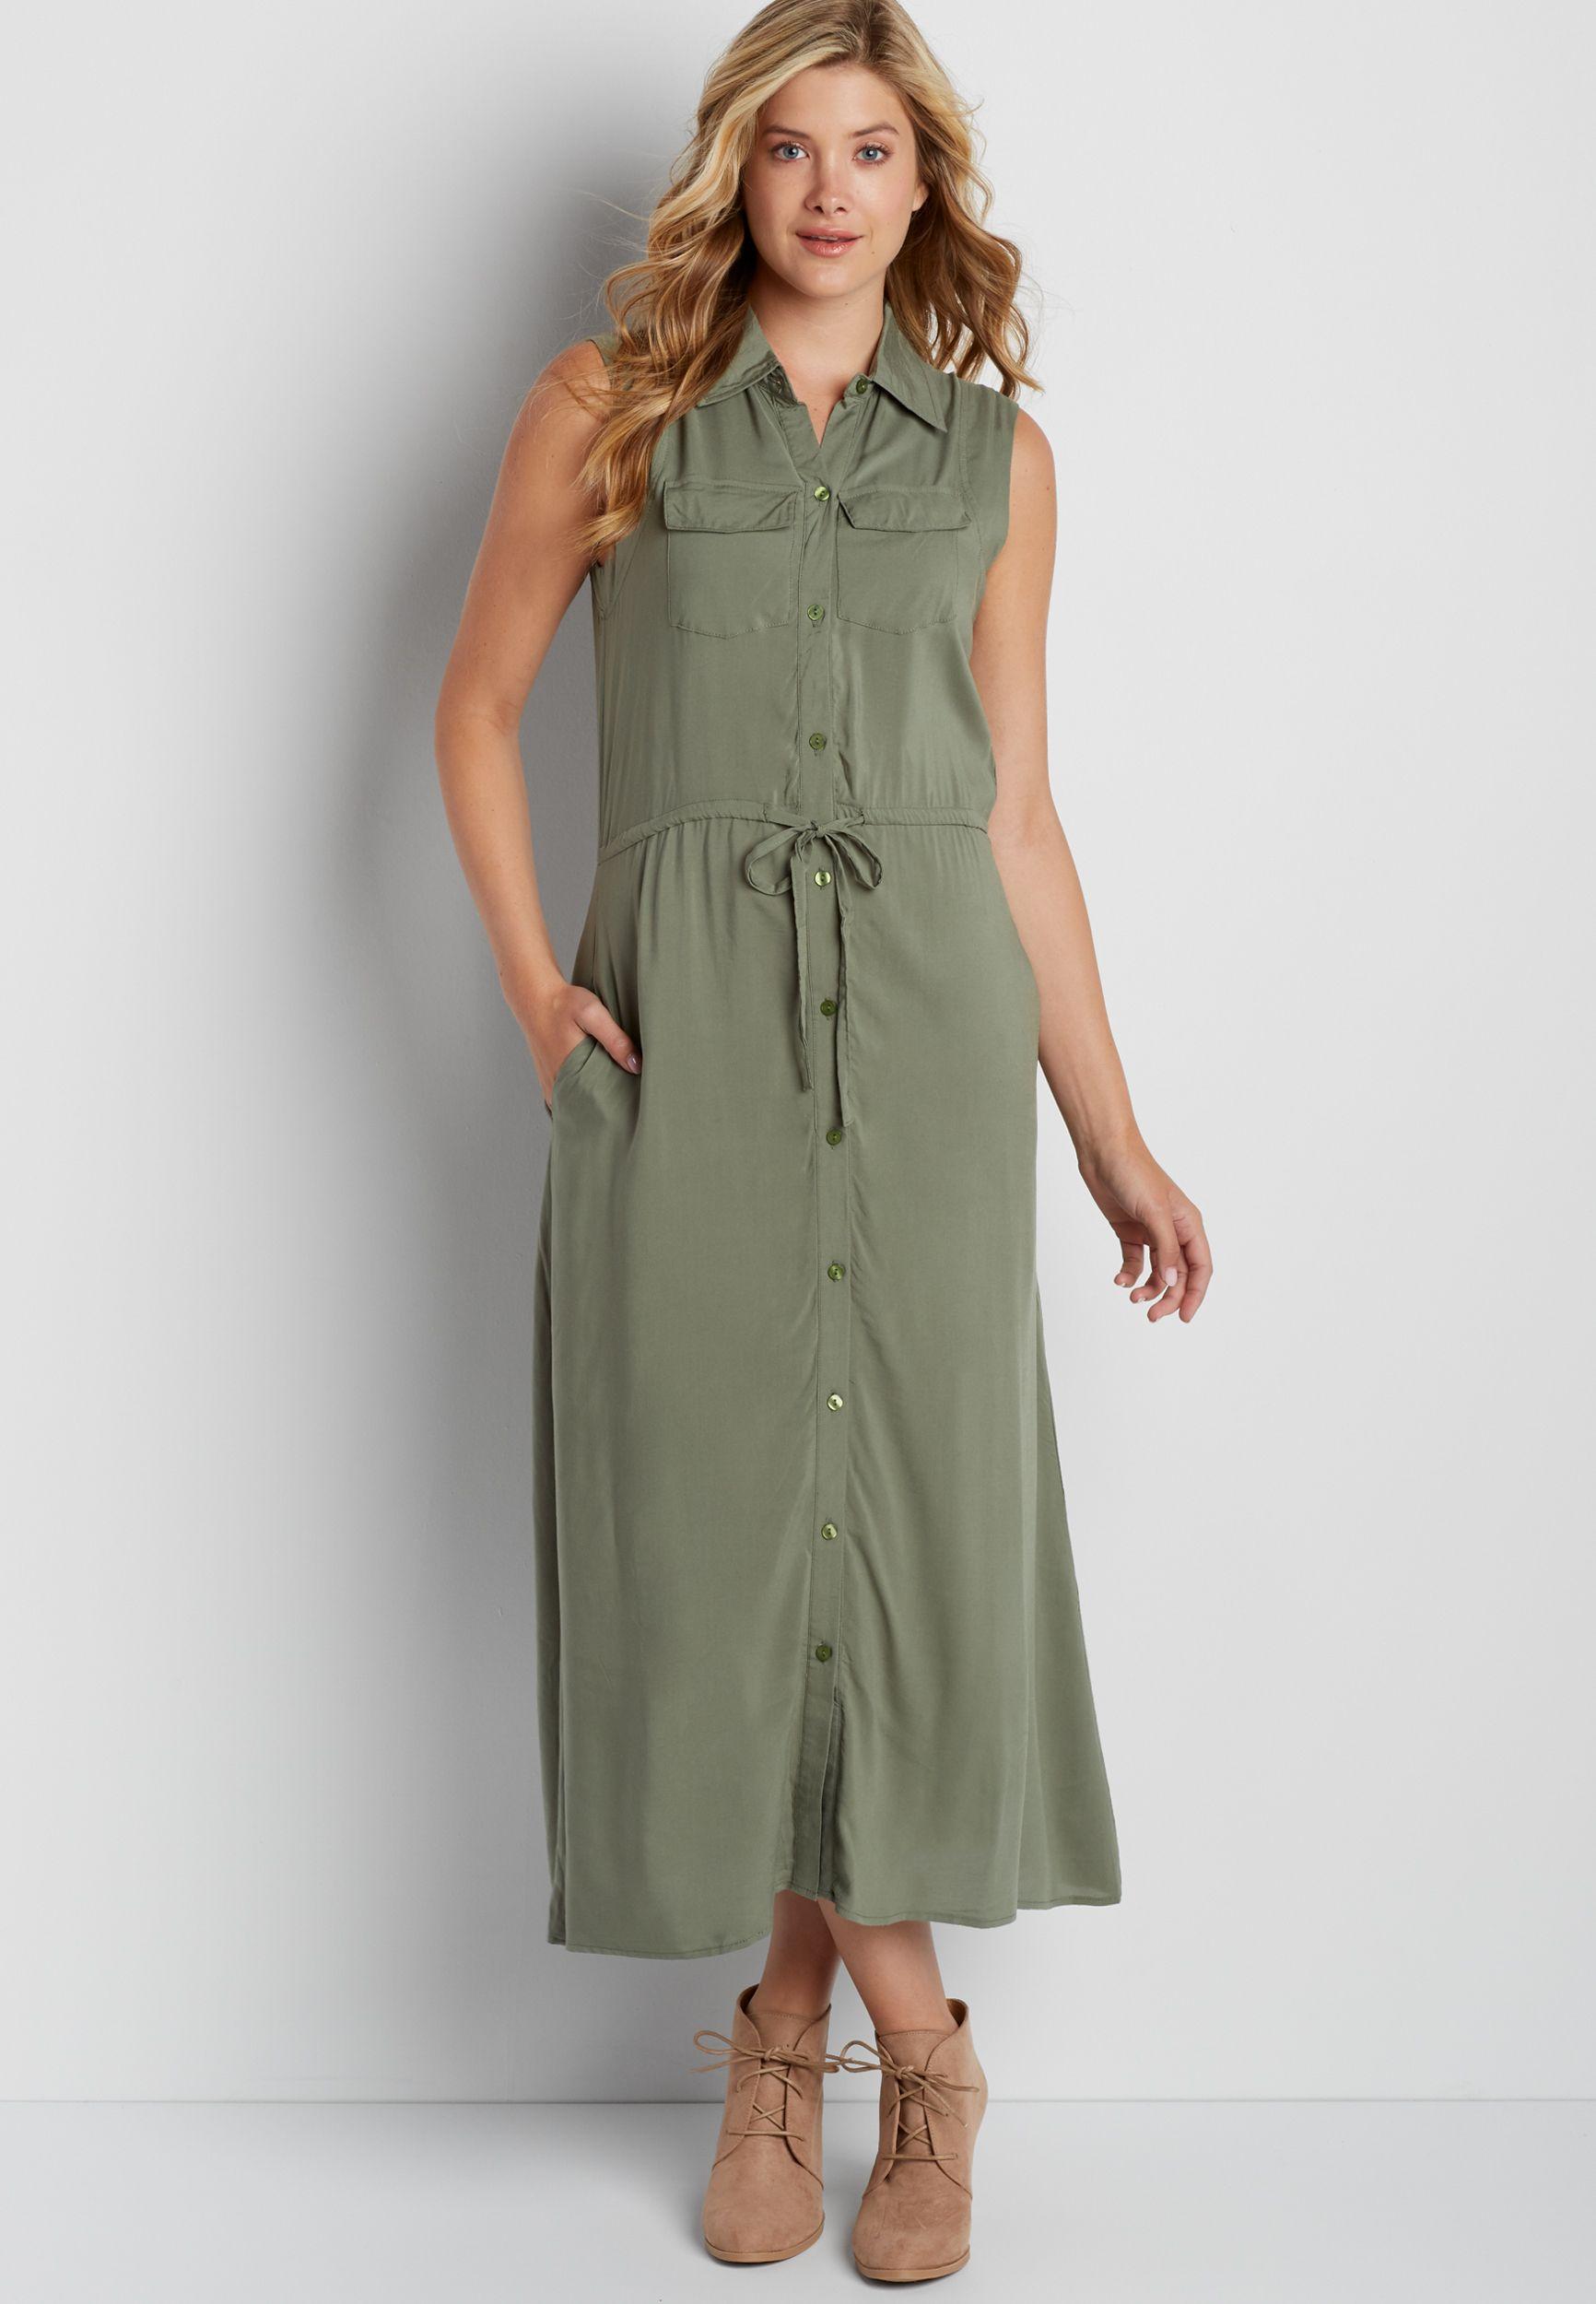 be88ead202de maxi shirtdress in olive green (original price